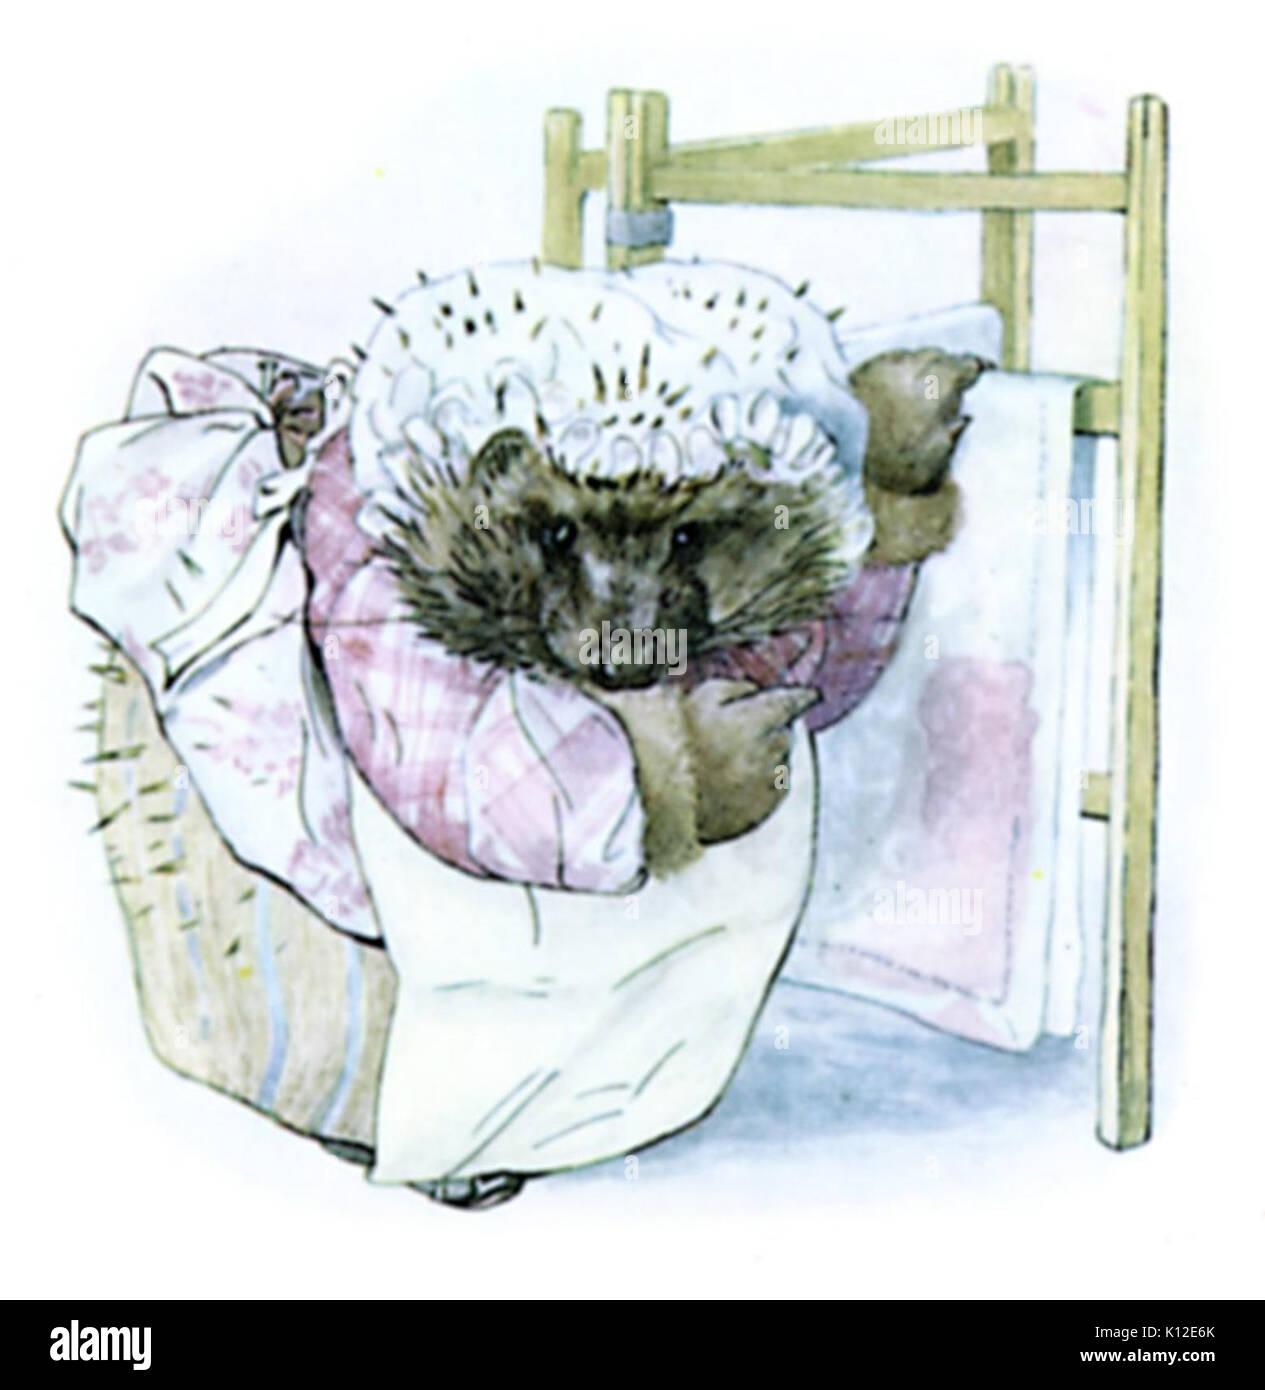 Beatrix Potter, Mrs Tiggy Winkle, Clothes horse - Stock Image